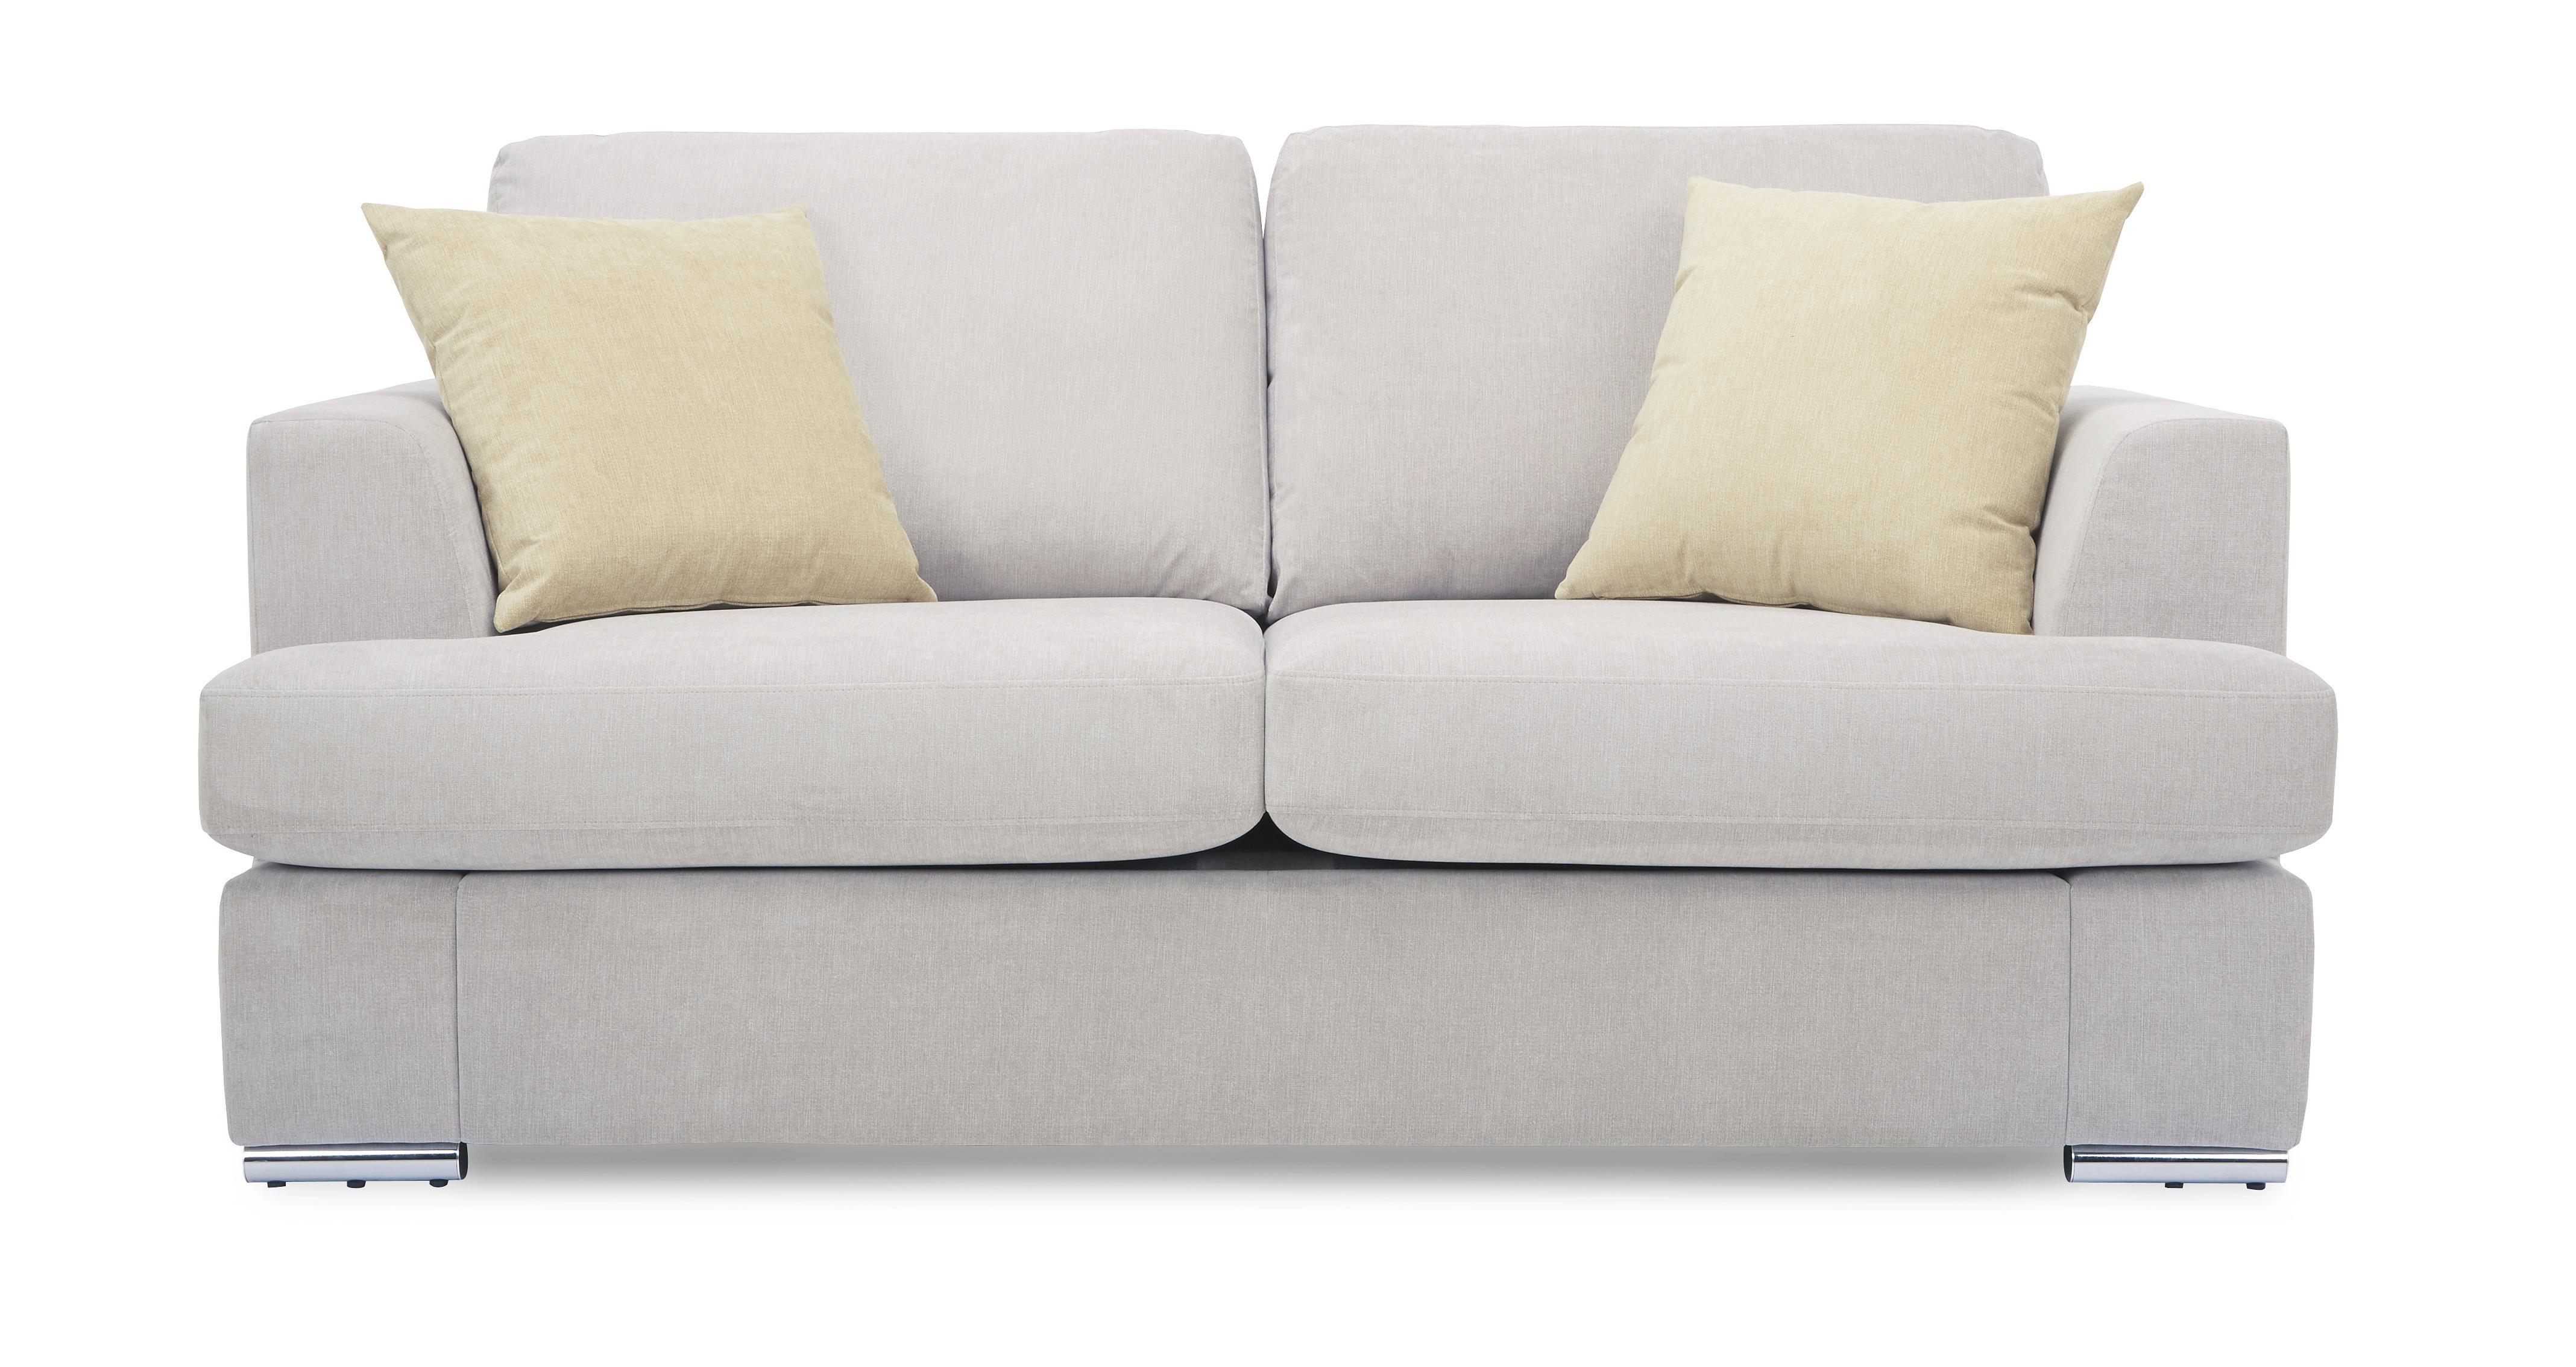 Freya 2 Seater Sofa DFS